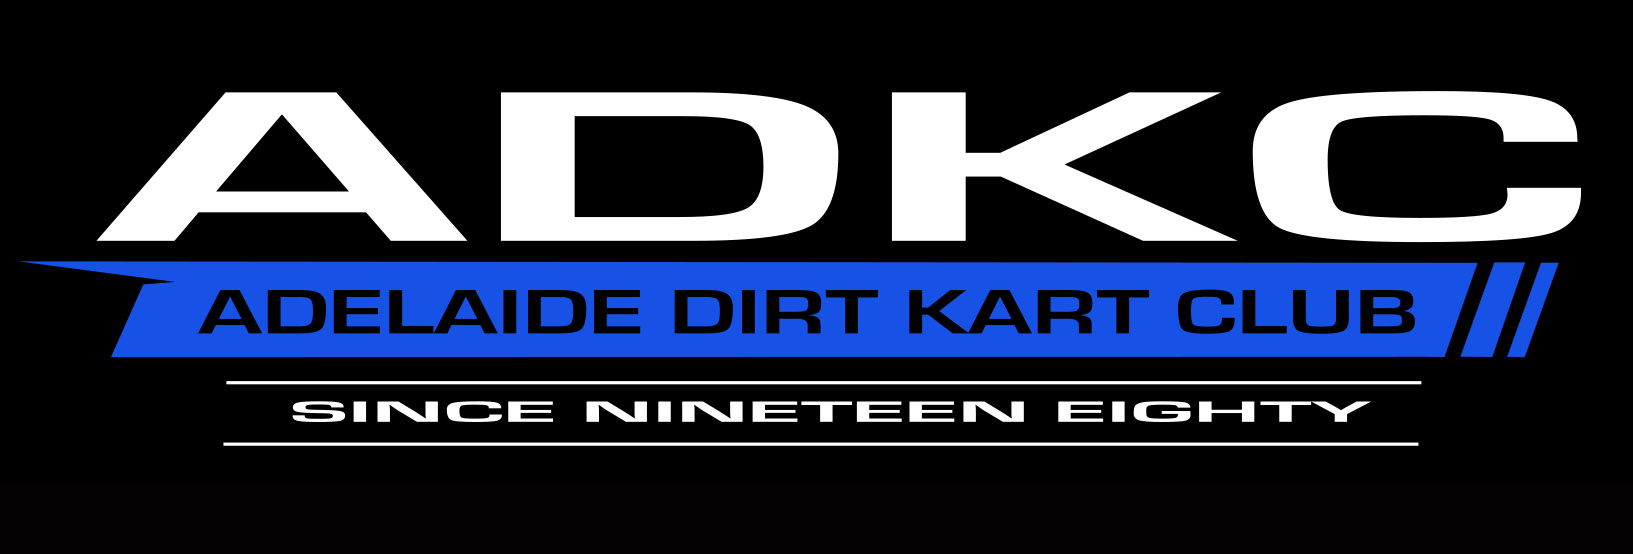 Adelaide Dirt Kart Club